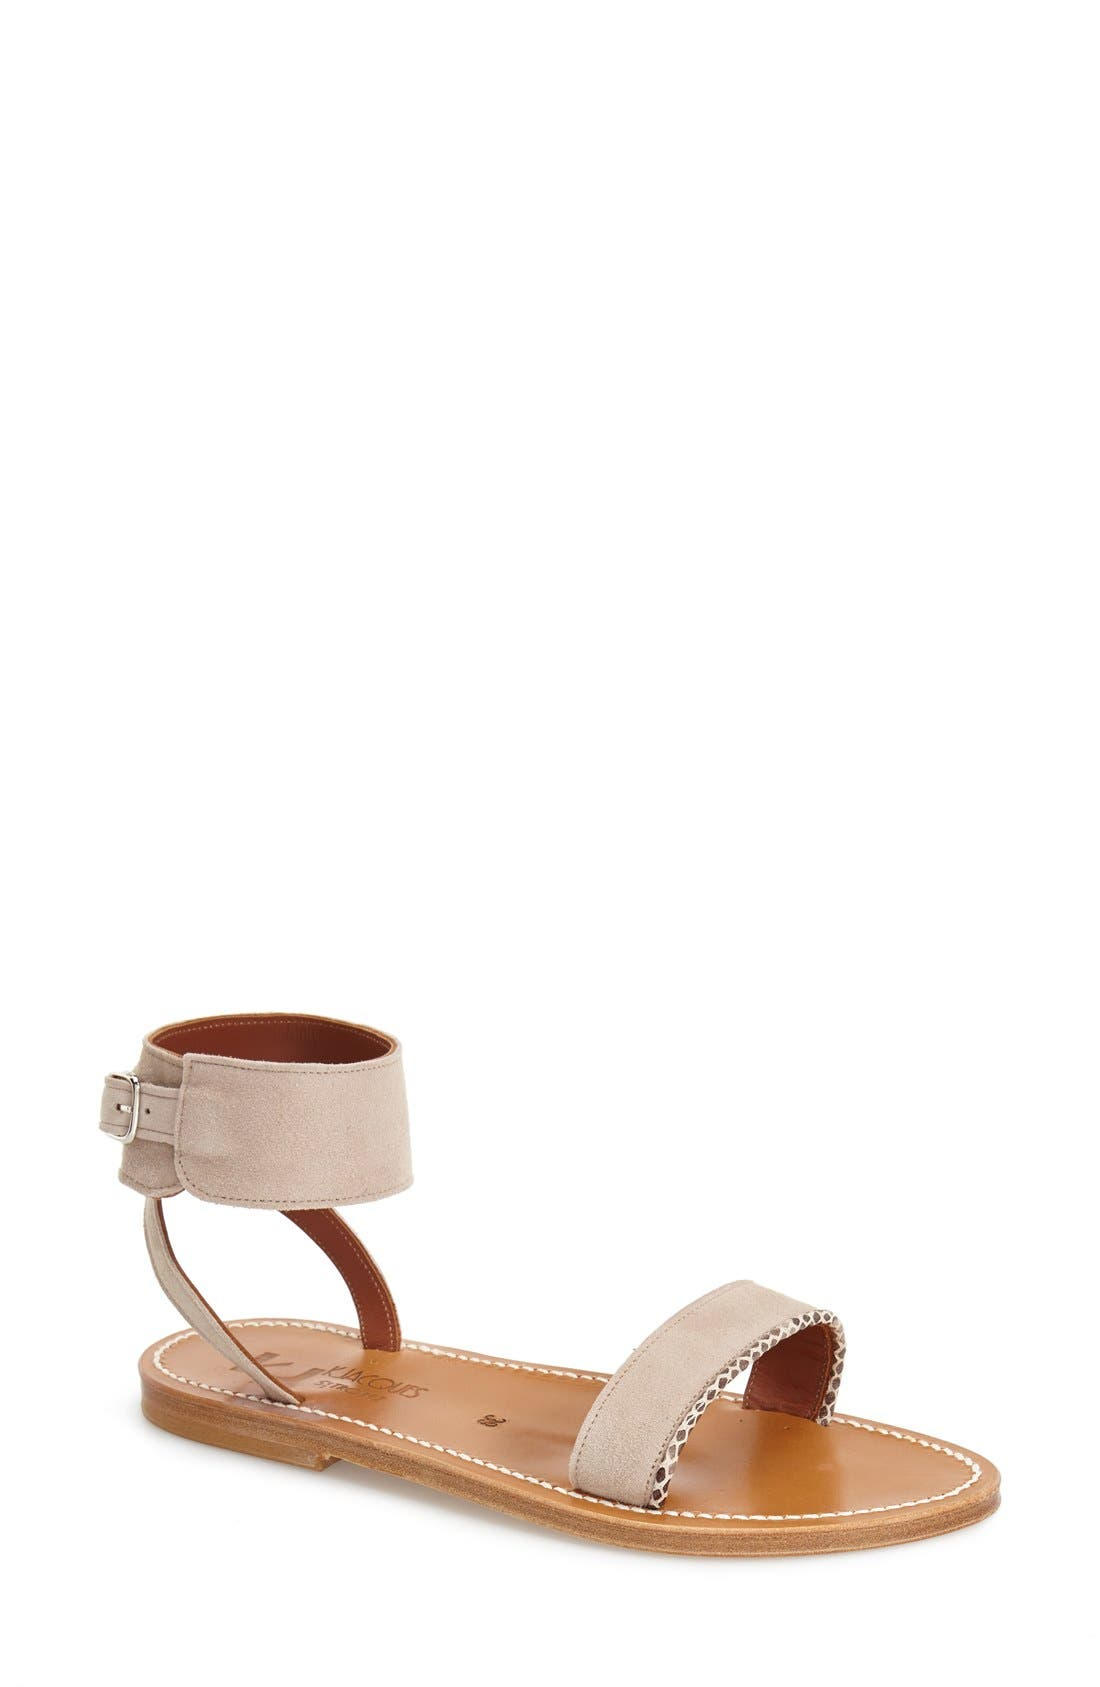 Main Image - K.Jacques St. Tropez 'Saratoga' Ankle Strap Sandal